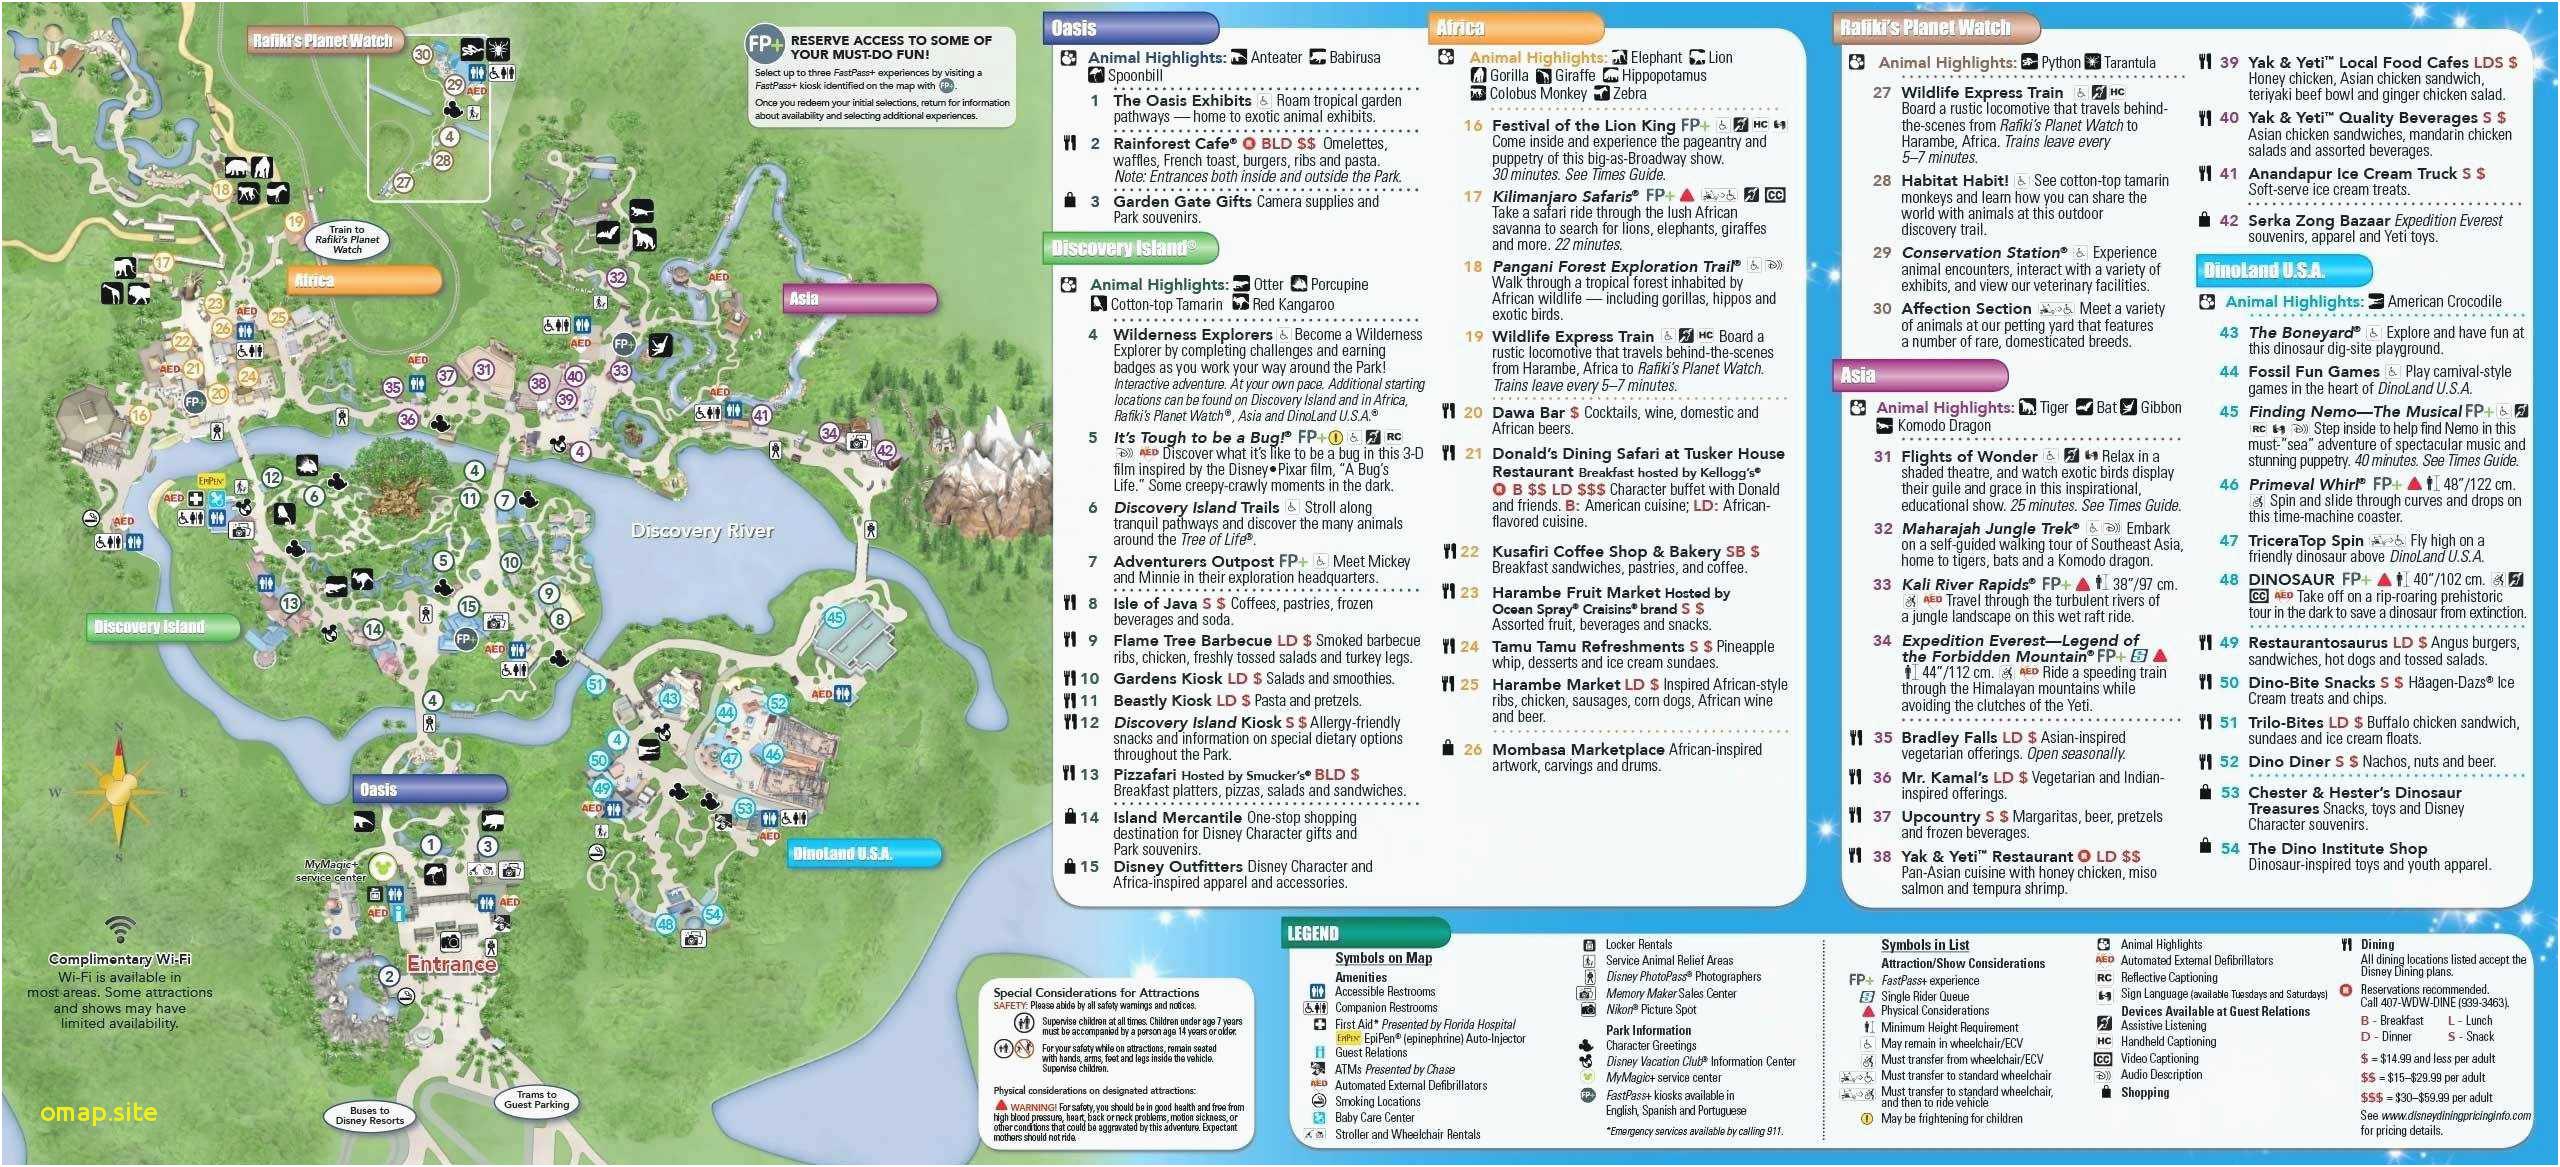 Disney World Map Magic Kingdom - Purefitness.cc - Printable Disney World Maps 2017